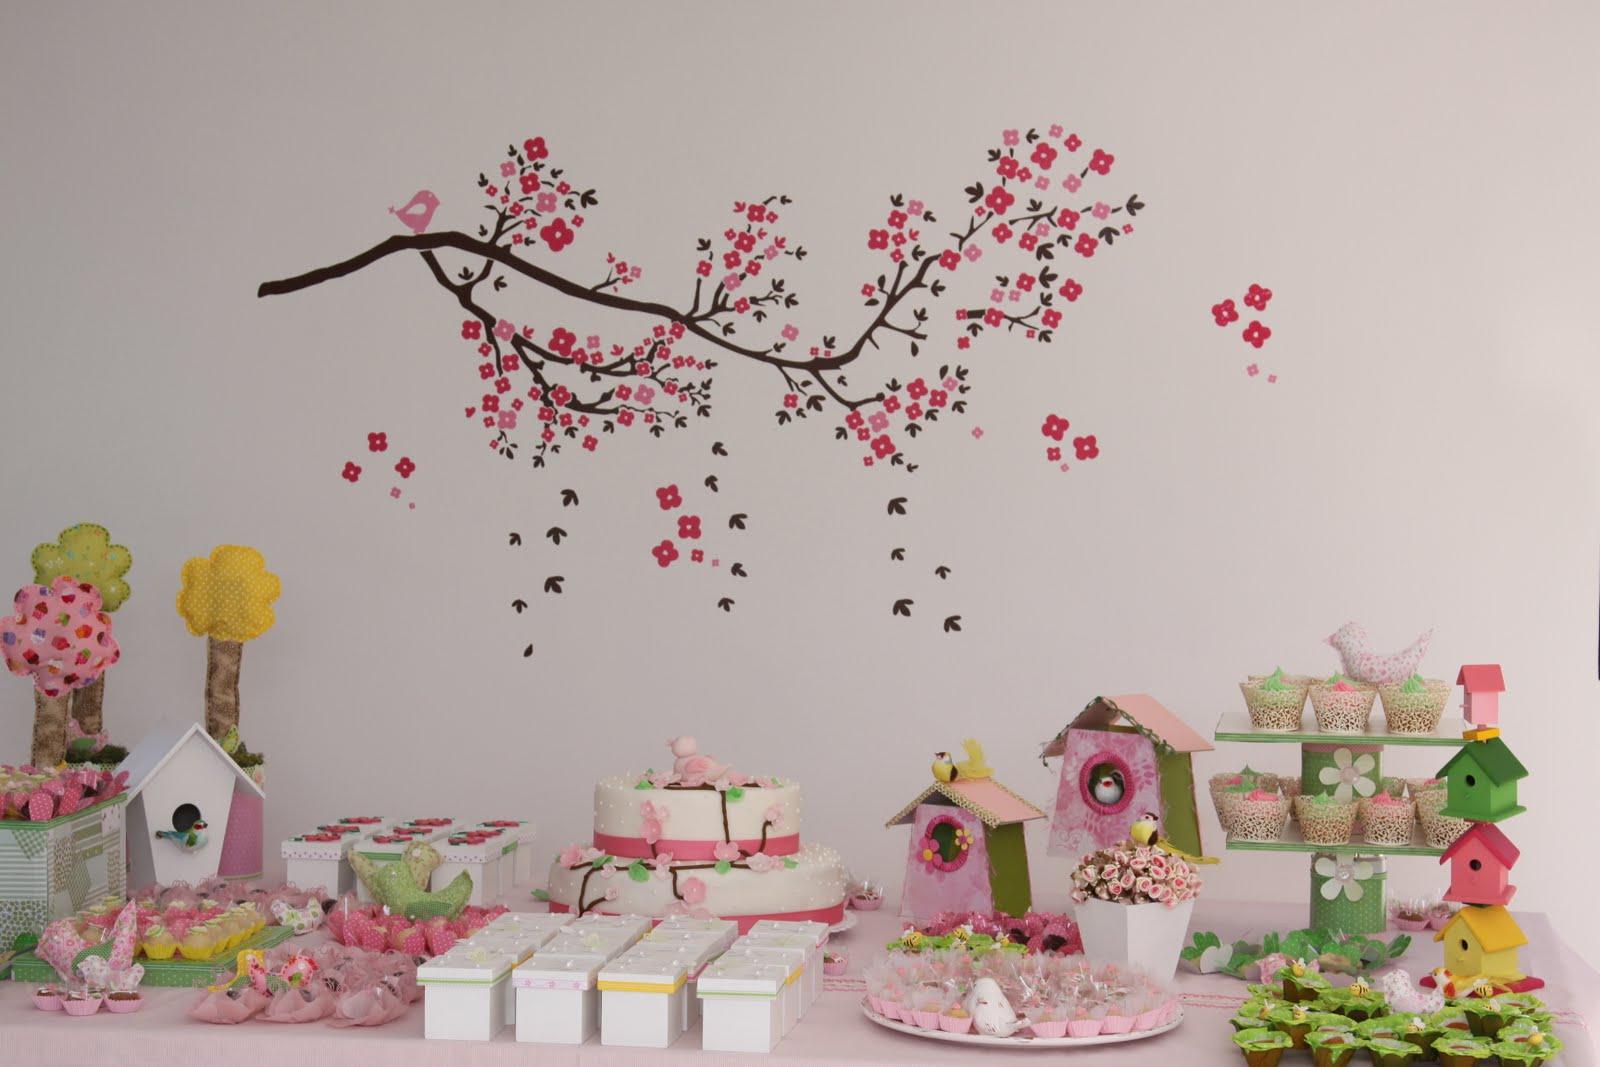 ideias de decoracao tema jardim : ideias de decoracao tema jardim:Tema De Festa Infantil